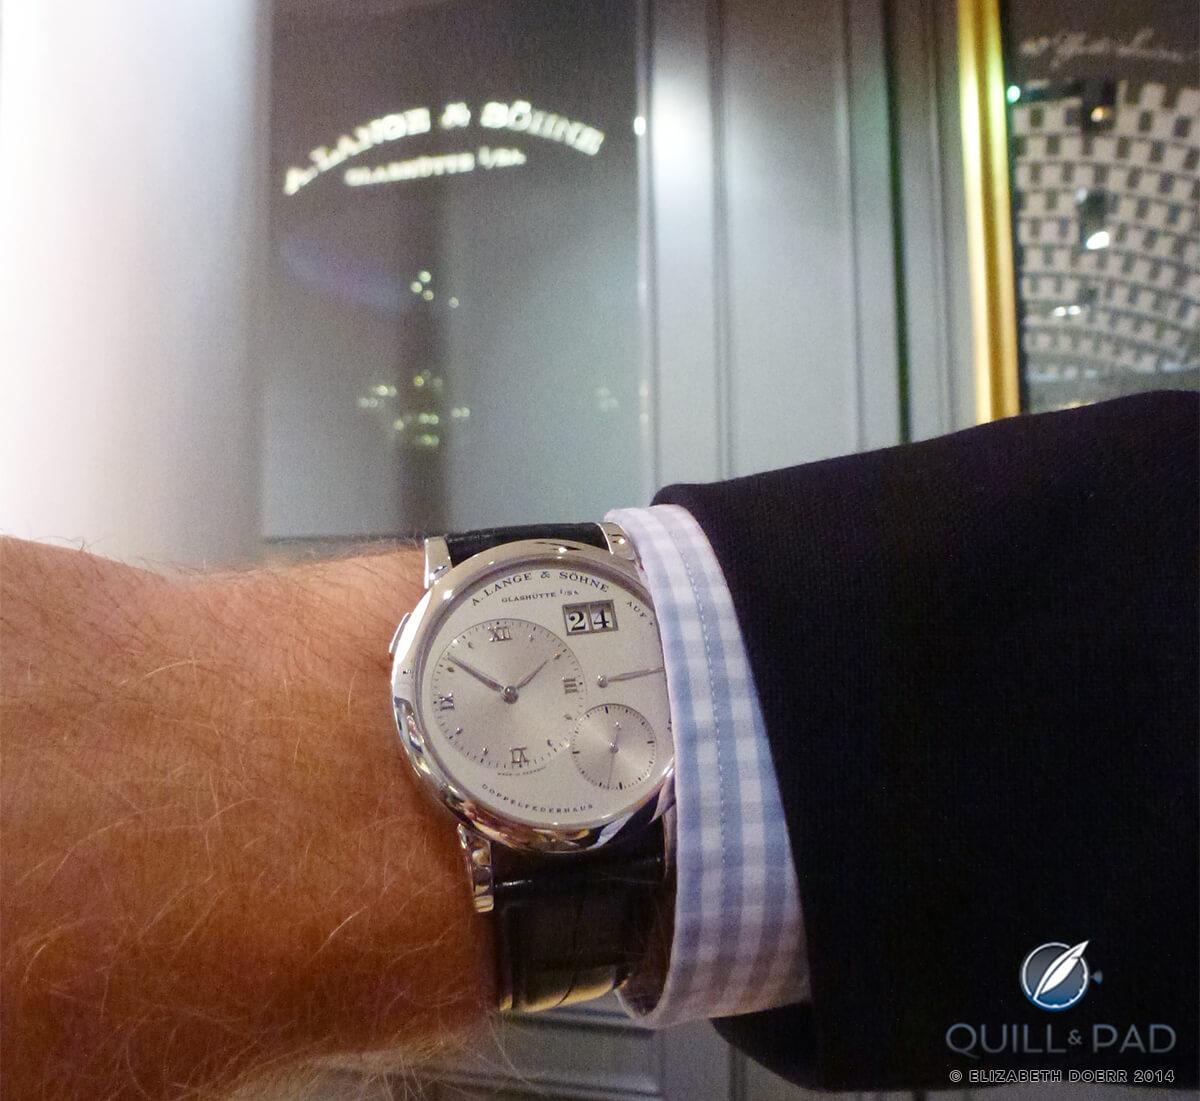 The Grand Lange 1 on the wrist inside A. Lange & Söhne's Dresden boutique